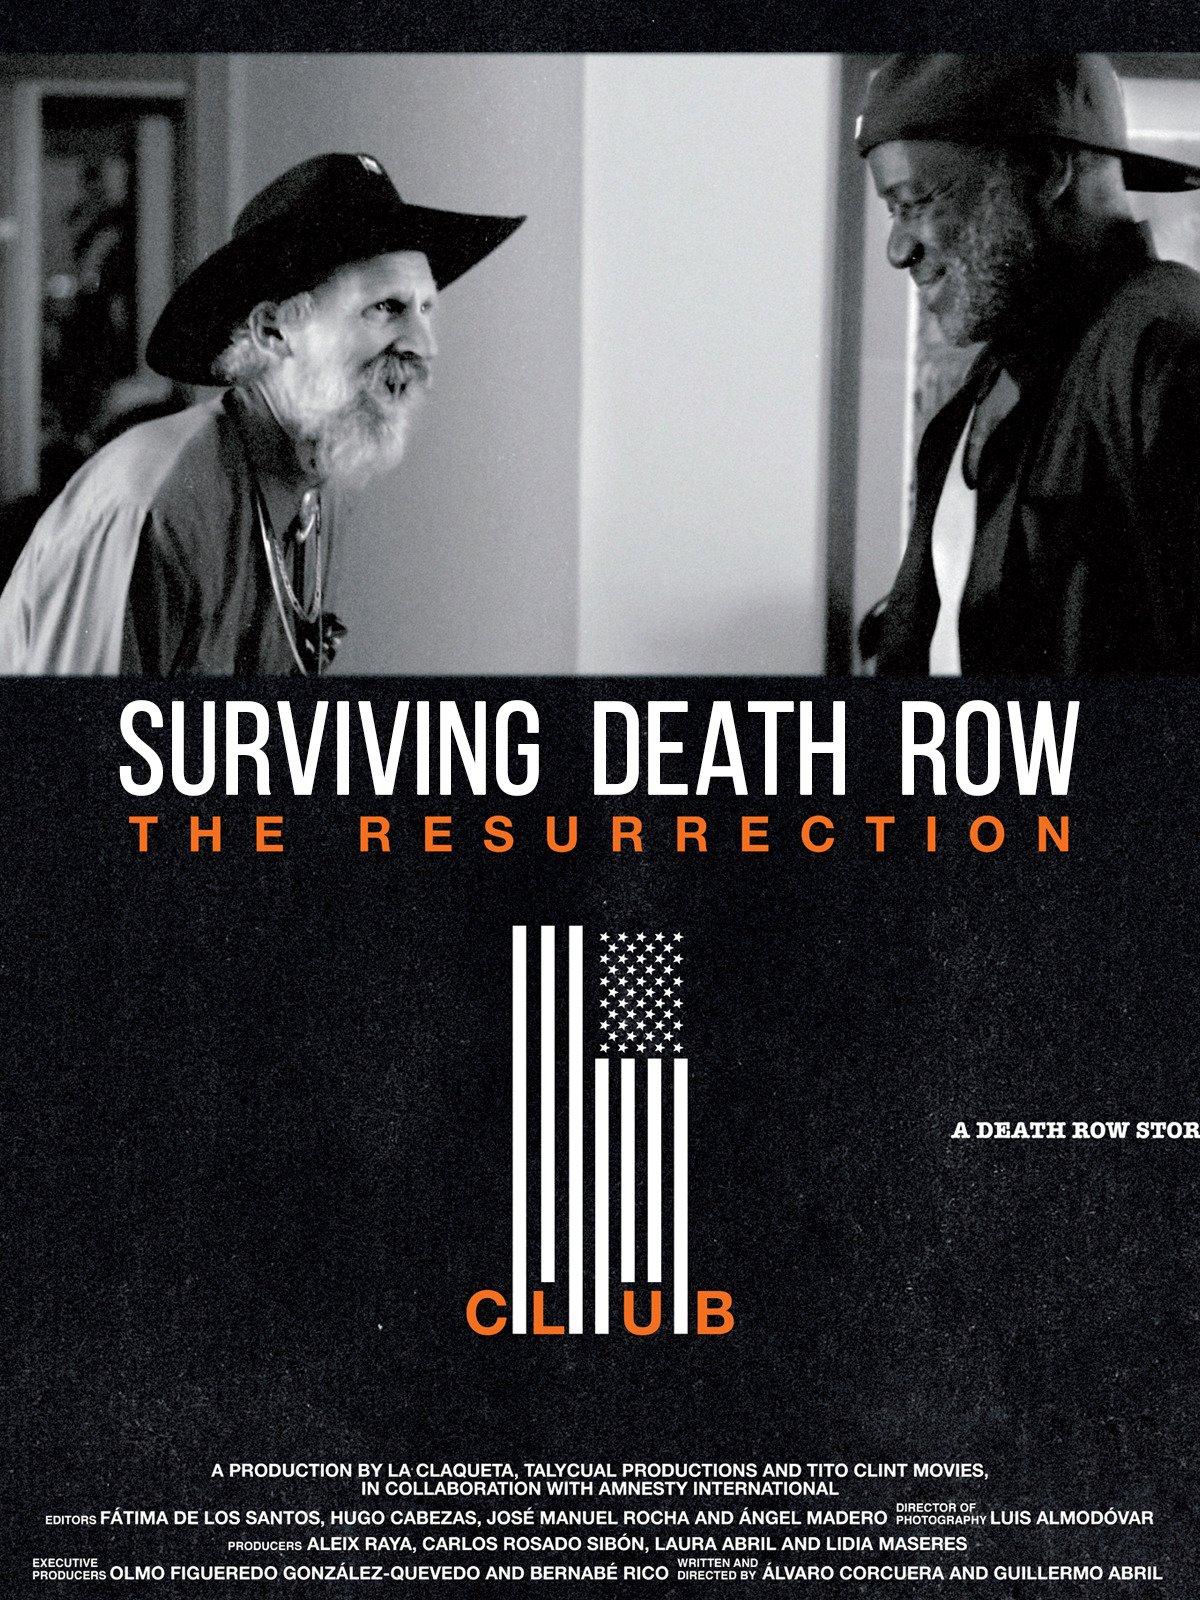 Surviving Death Row: The Resurrection Club